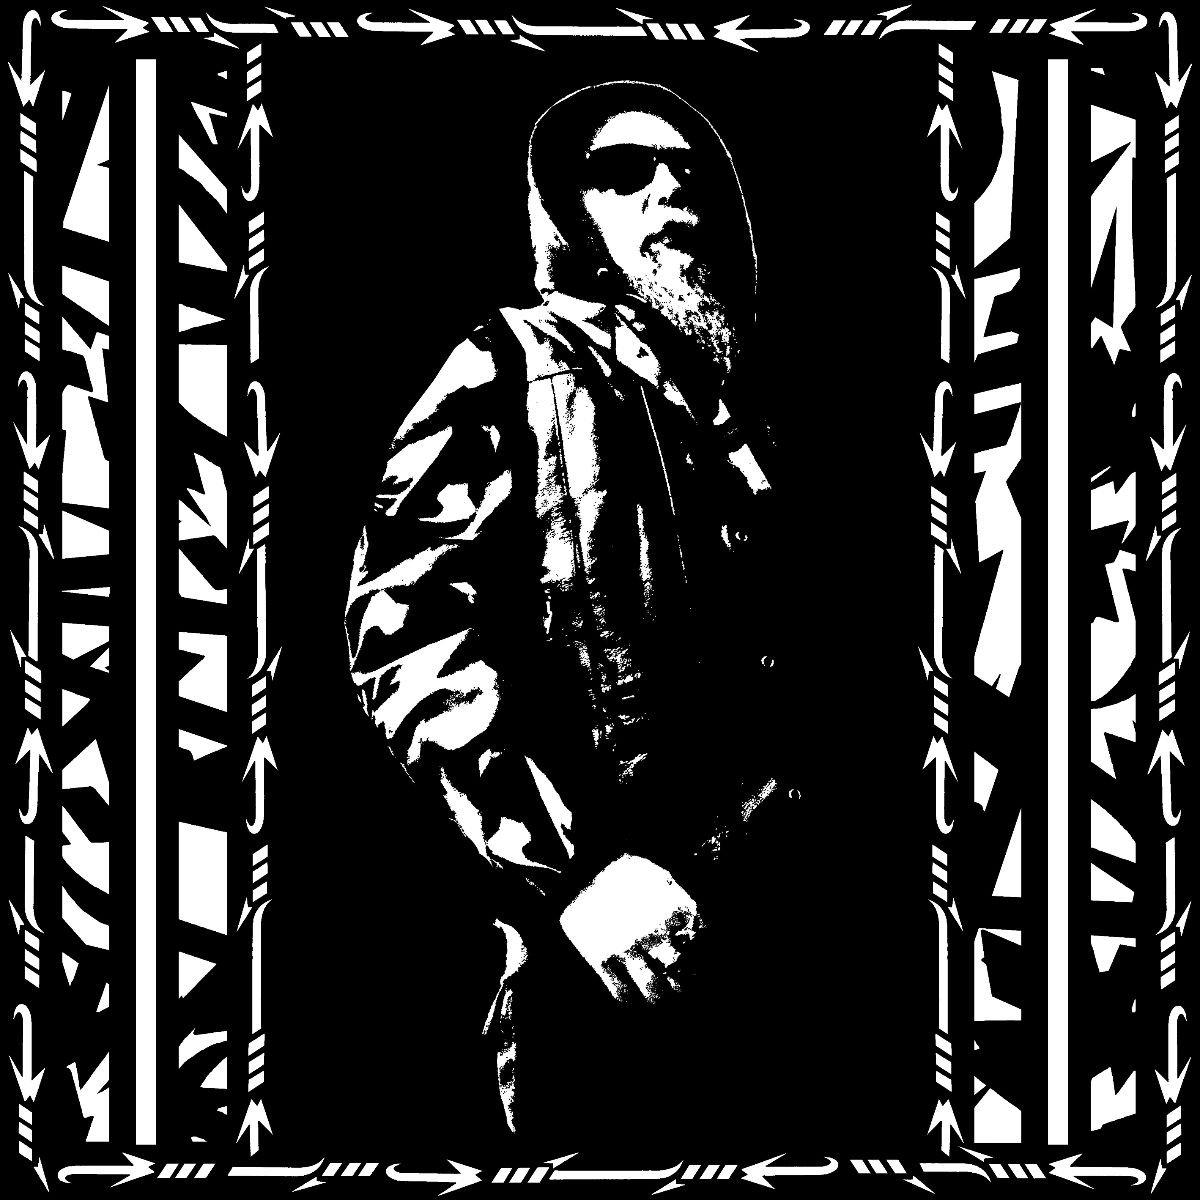 REVENGE Αnnounce Νew Αlbum 'Strike.Smother.Dehumanize'.